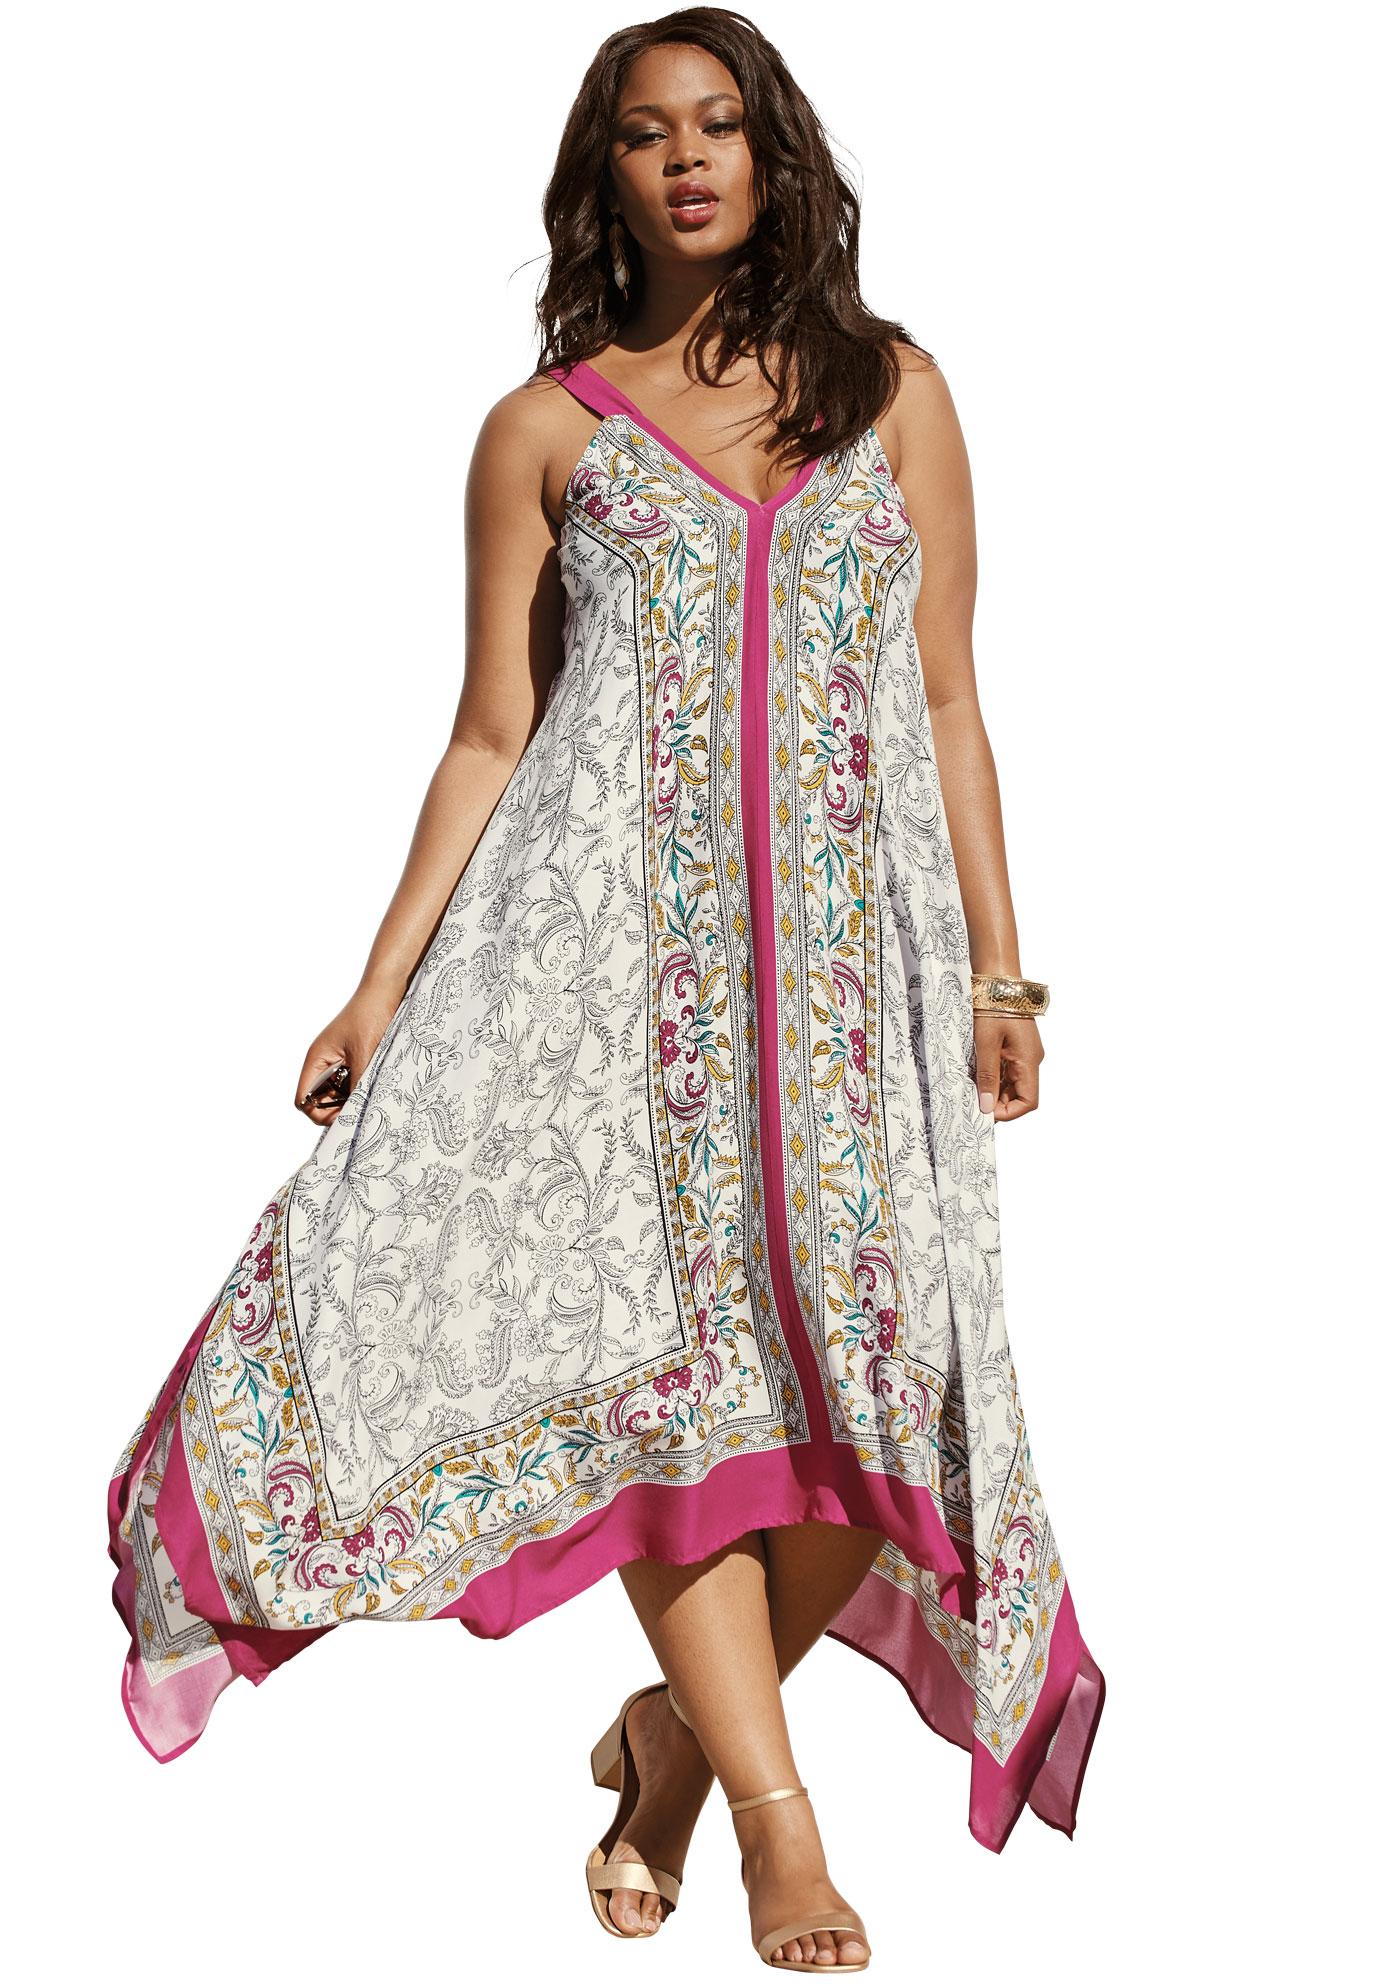 Roaman S Roaman S Plus Size Scarf Print Maxi Dress With Handkerchief Hem Walmart Com Plus Size Summer Dresses Plus Size Maxi Dresses Printed Maxi Dress [ 1986 x 1380 Pixel ]